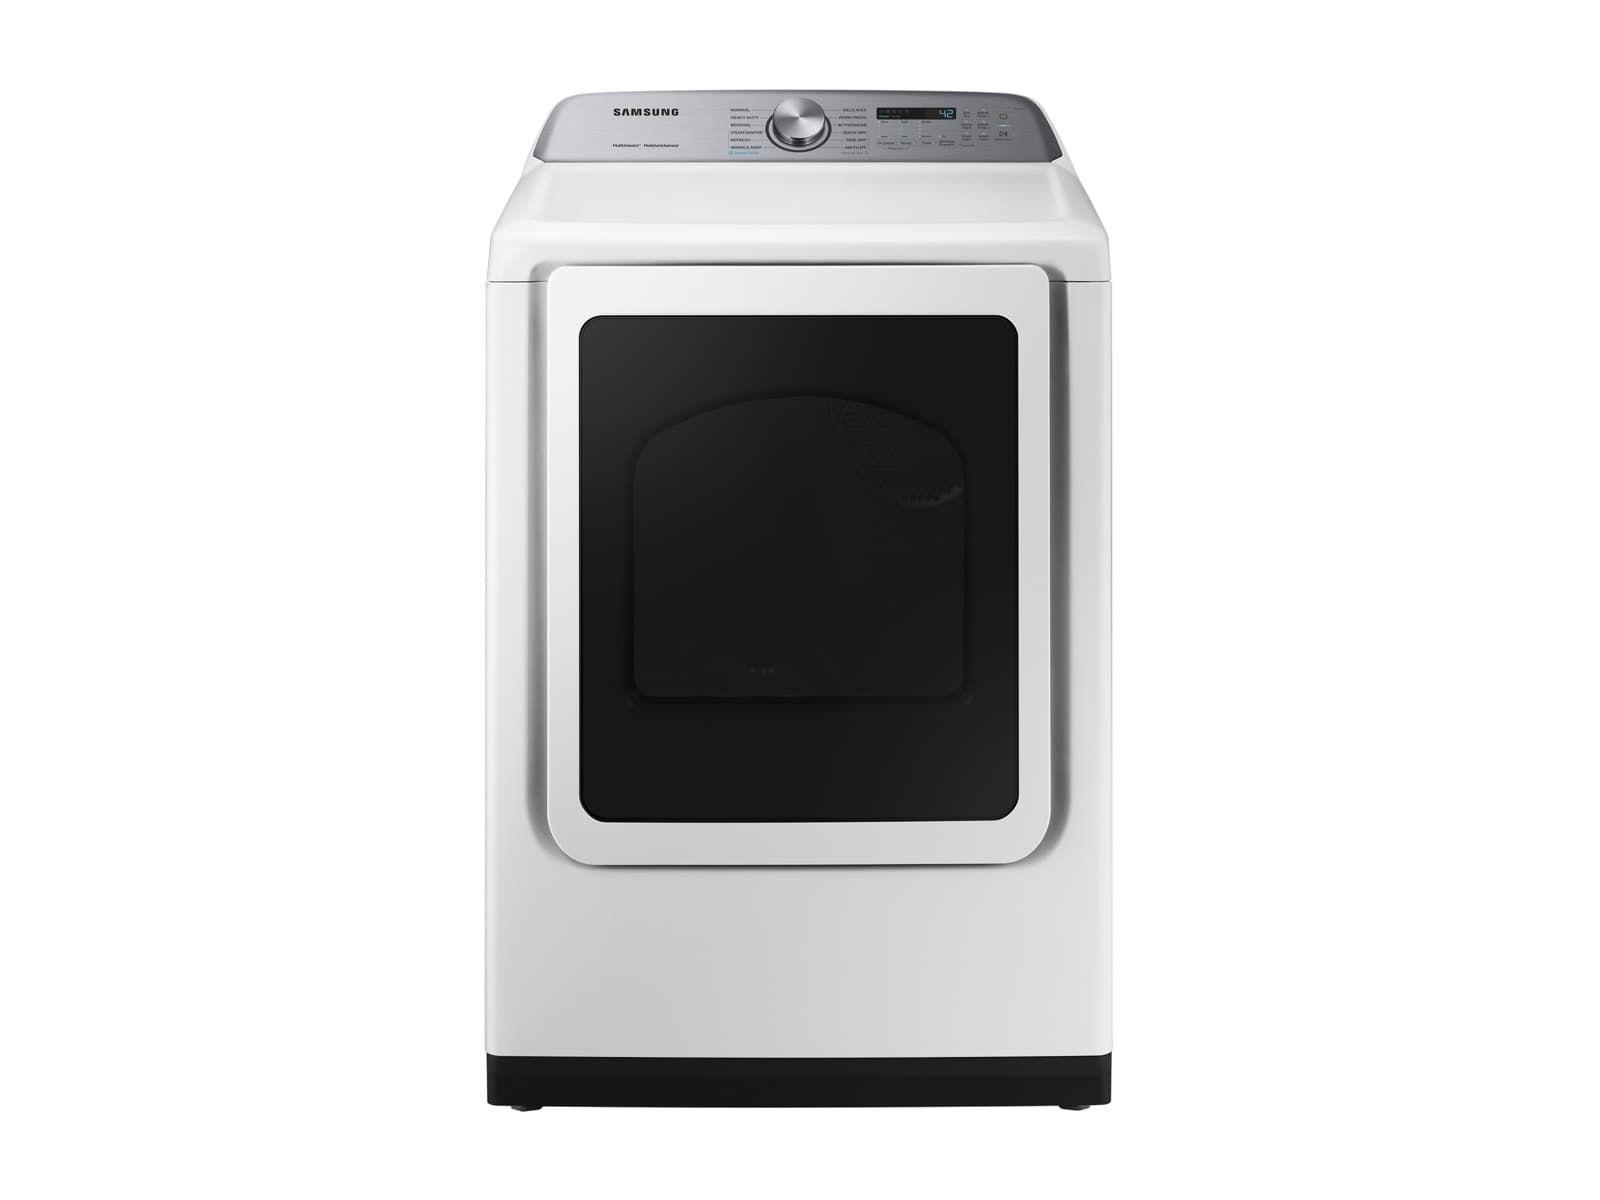 kitchenaid ensemble washer and dryer